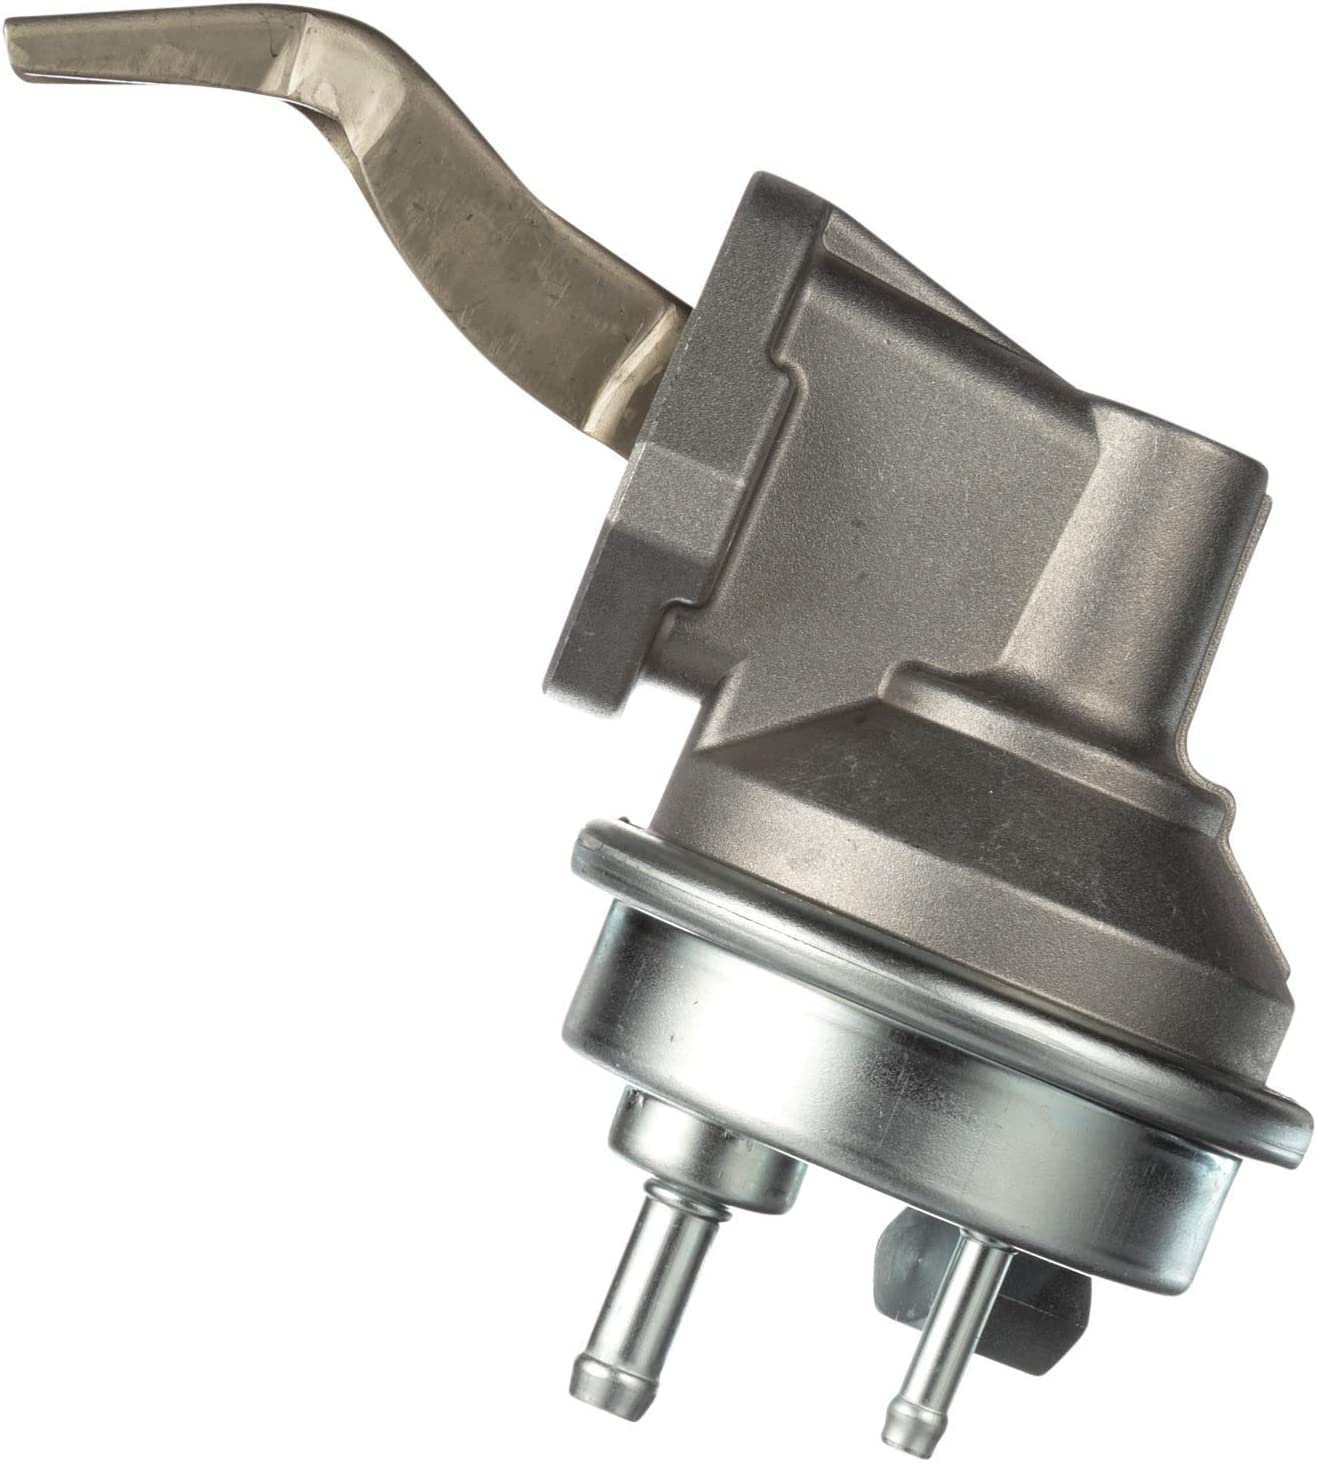 Delphi MF0151 Mechanical Fuel Pump